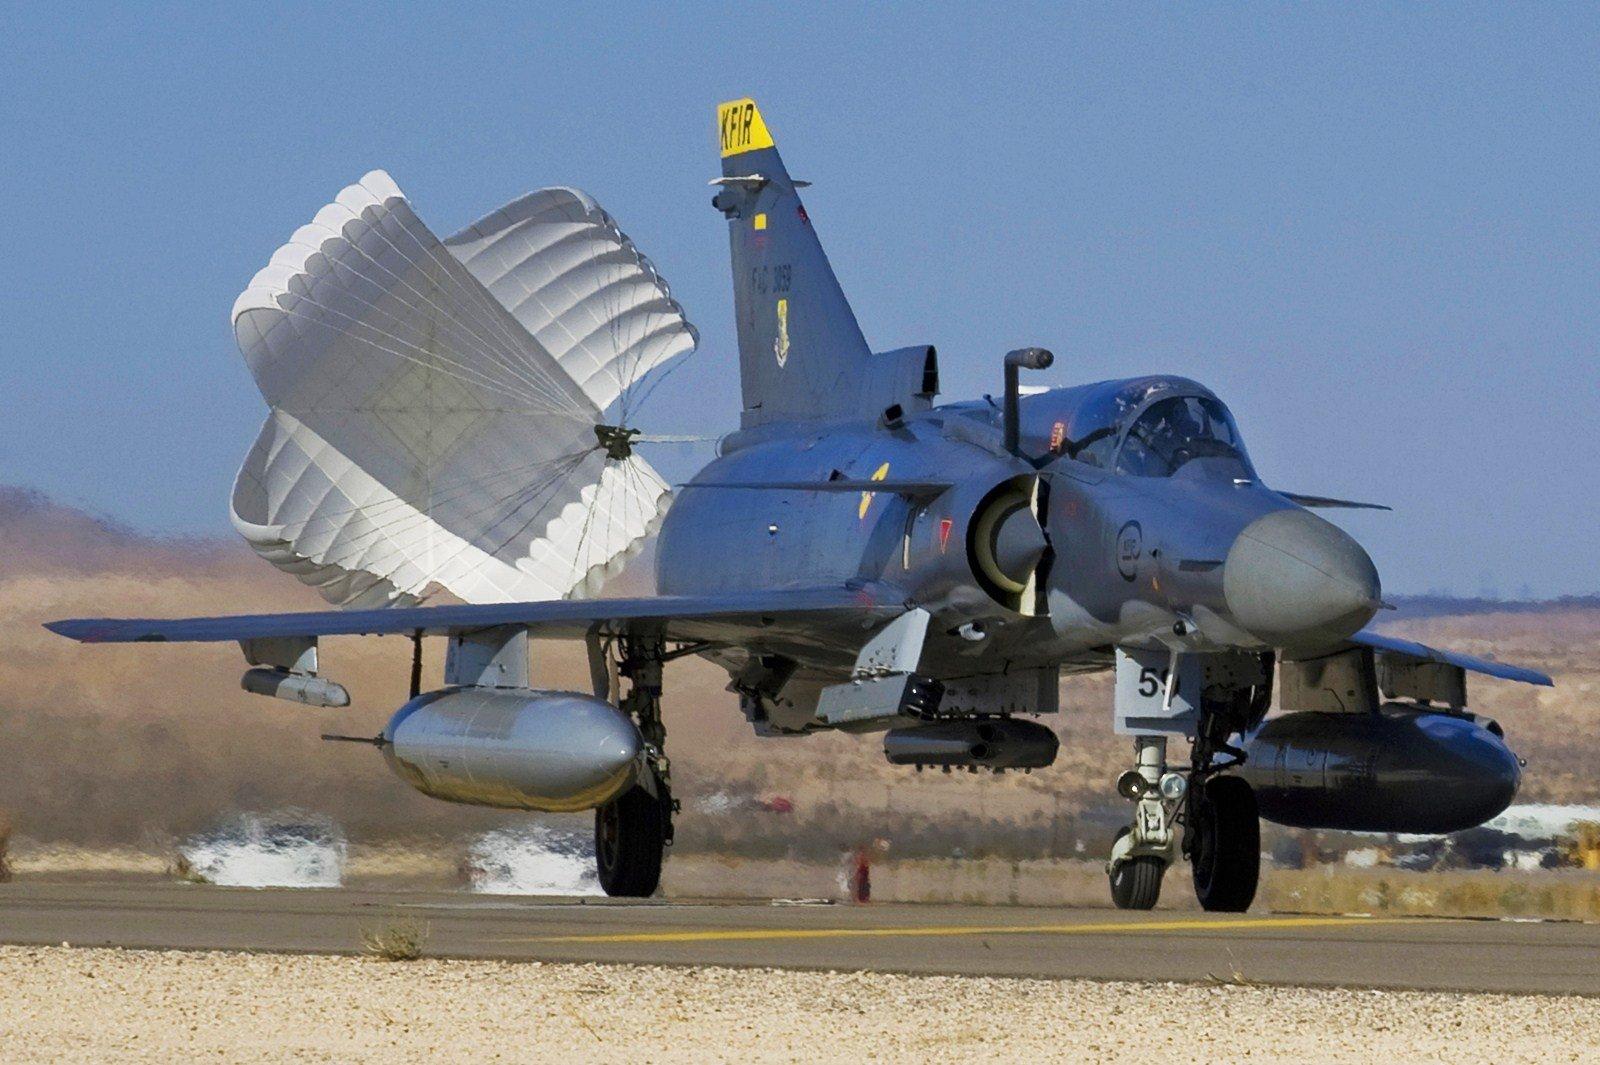 Vídeo: Kfir Block 60 - Poder Aéreo - Forças Aéreas